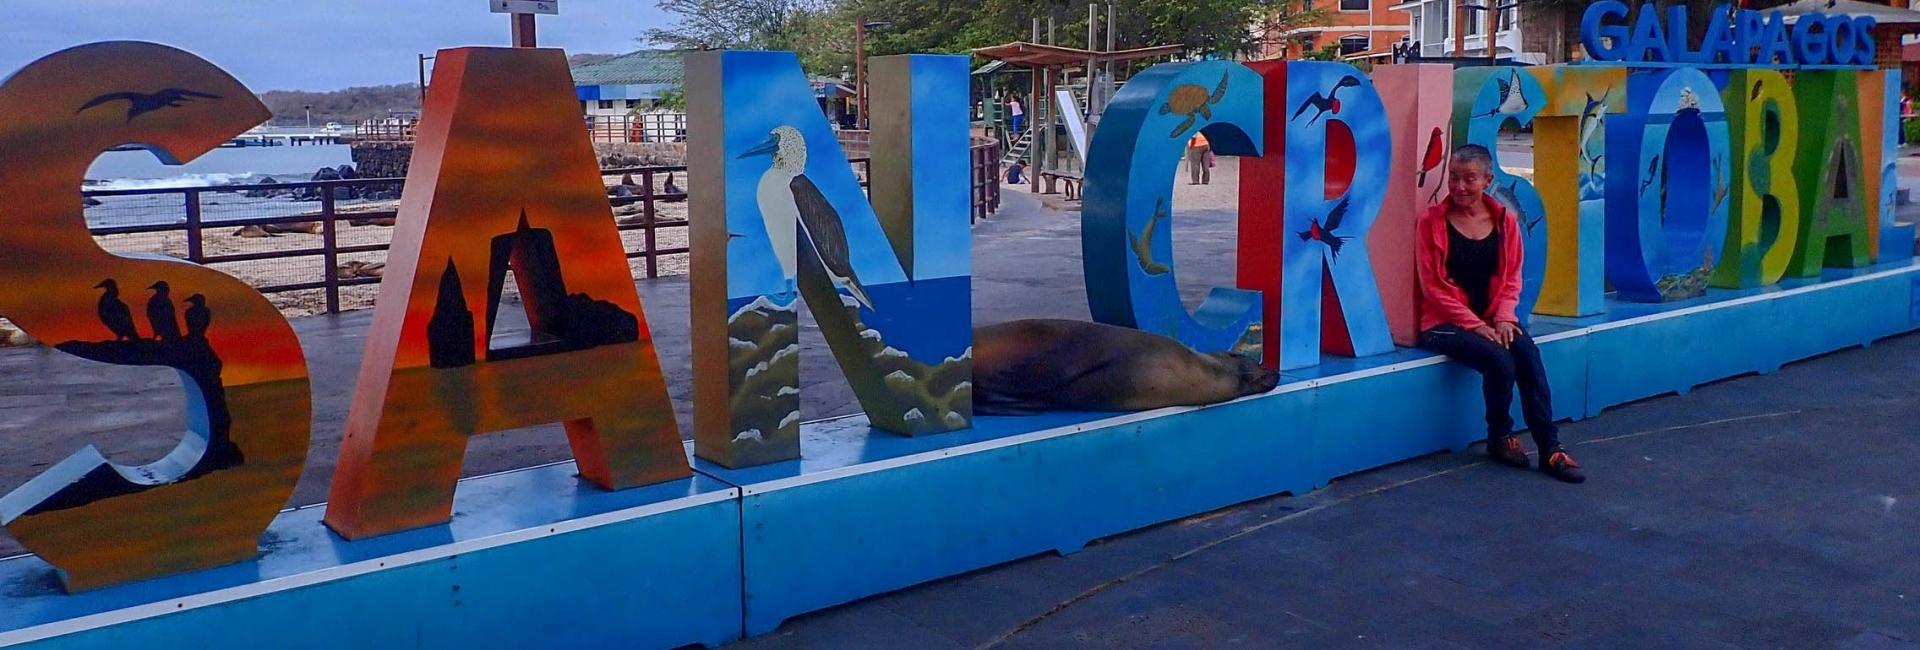 2018-11-09-isla-cristobal-410.jpg